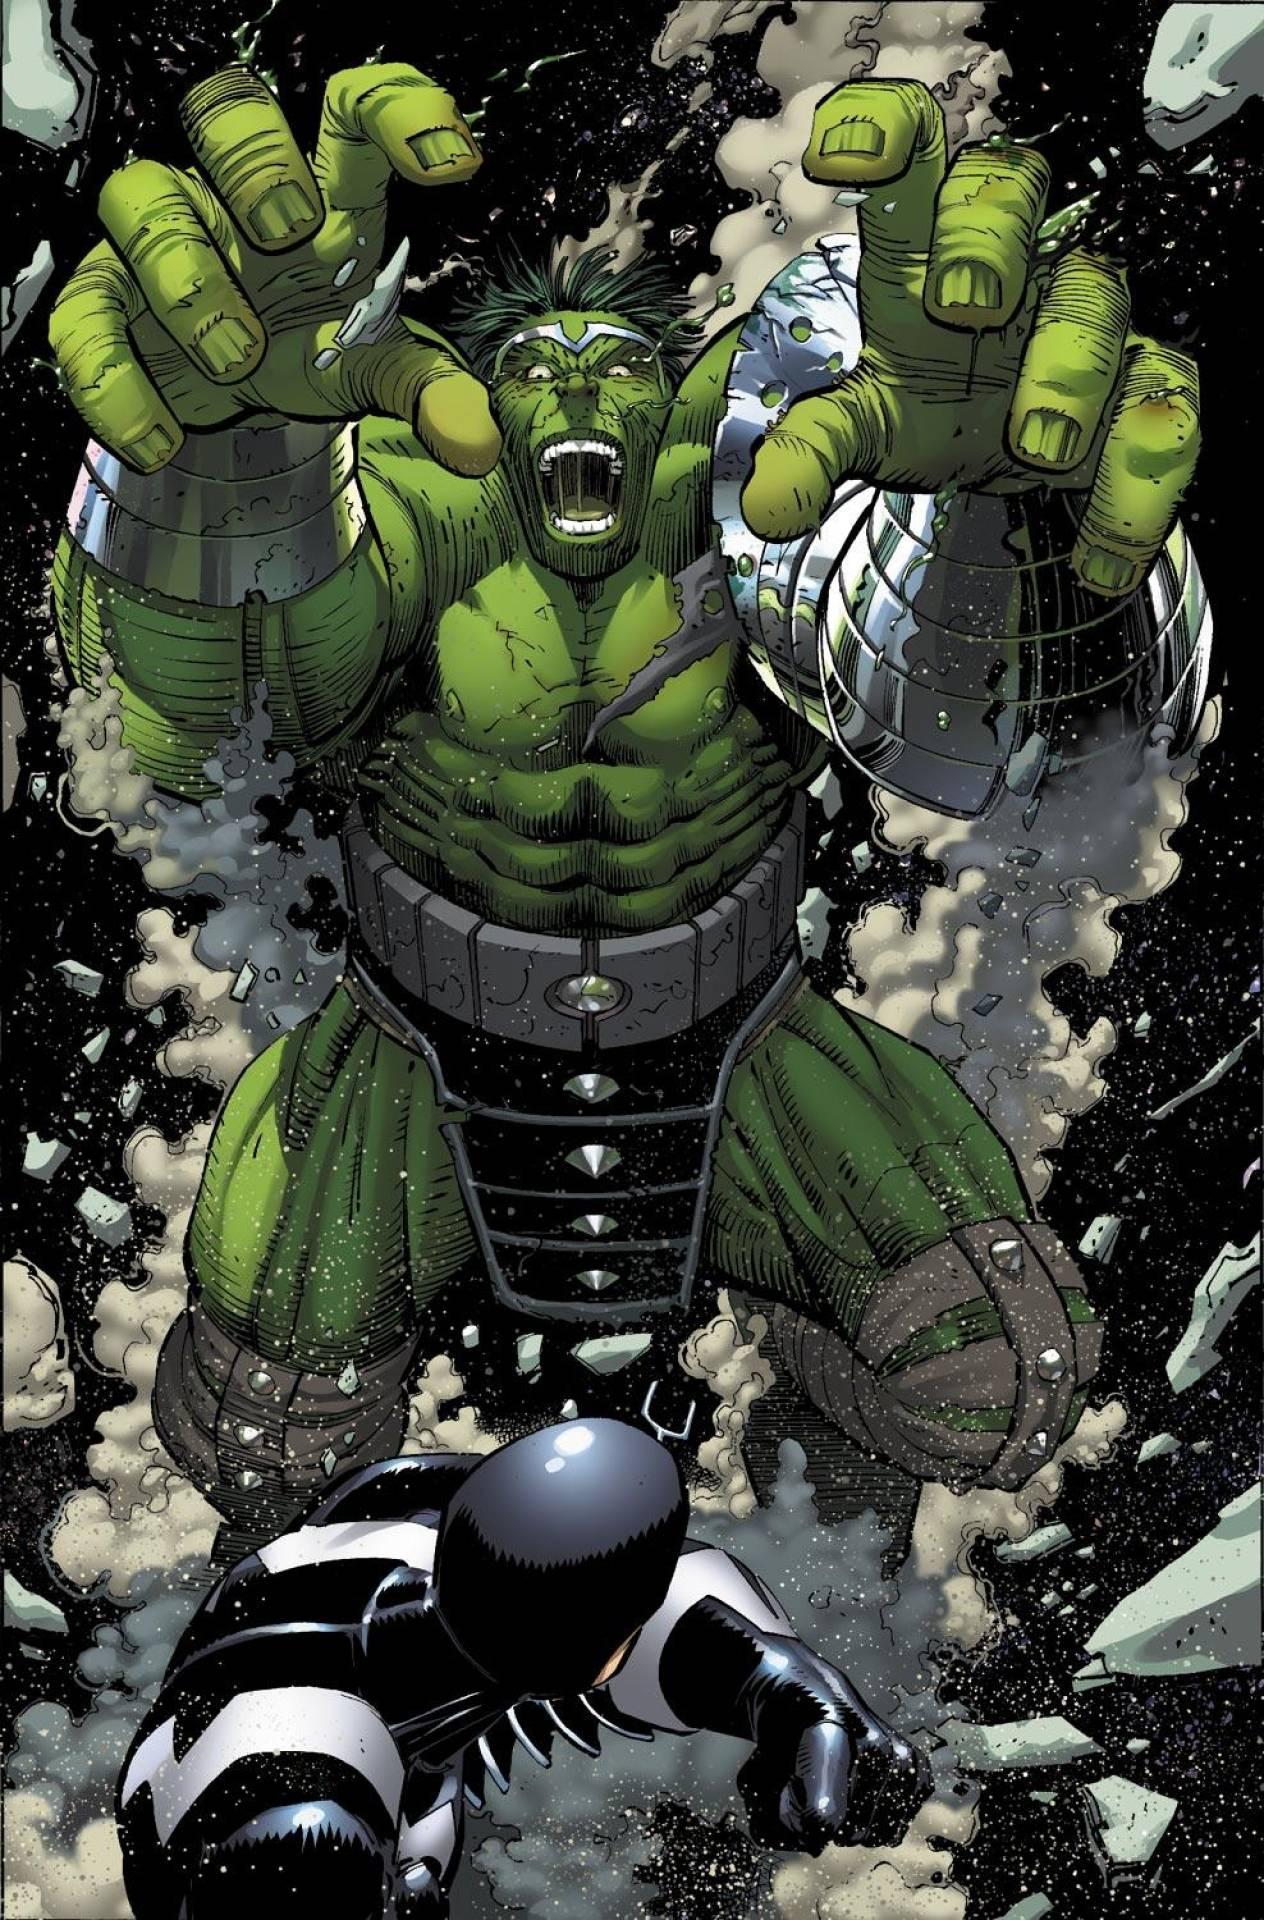 Hulk vs. Black Bolt by John Romita Jr.